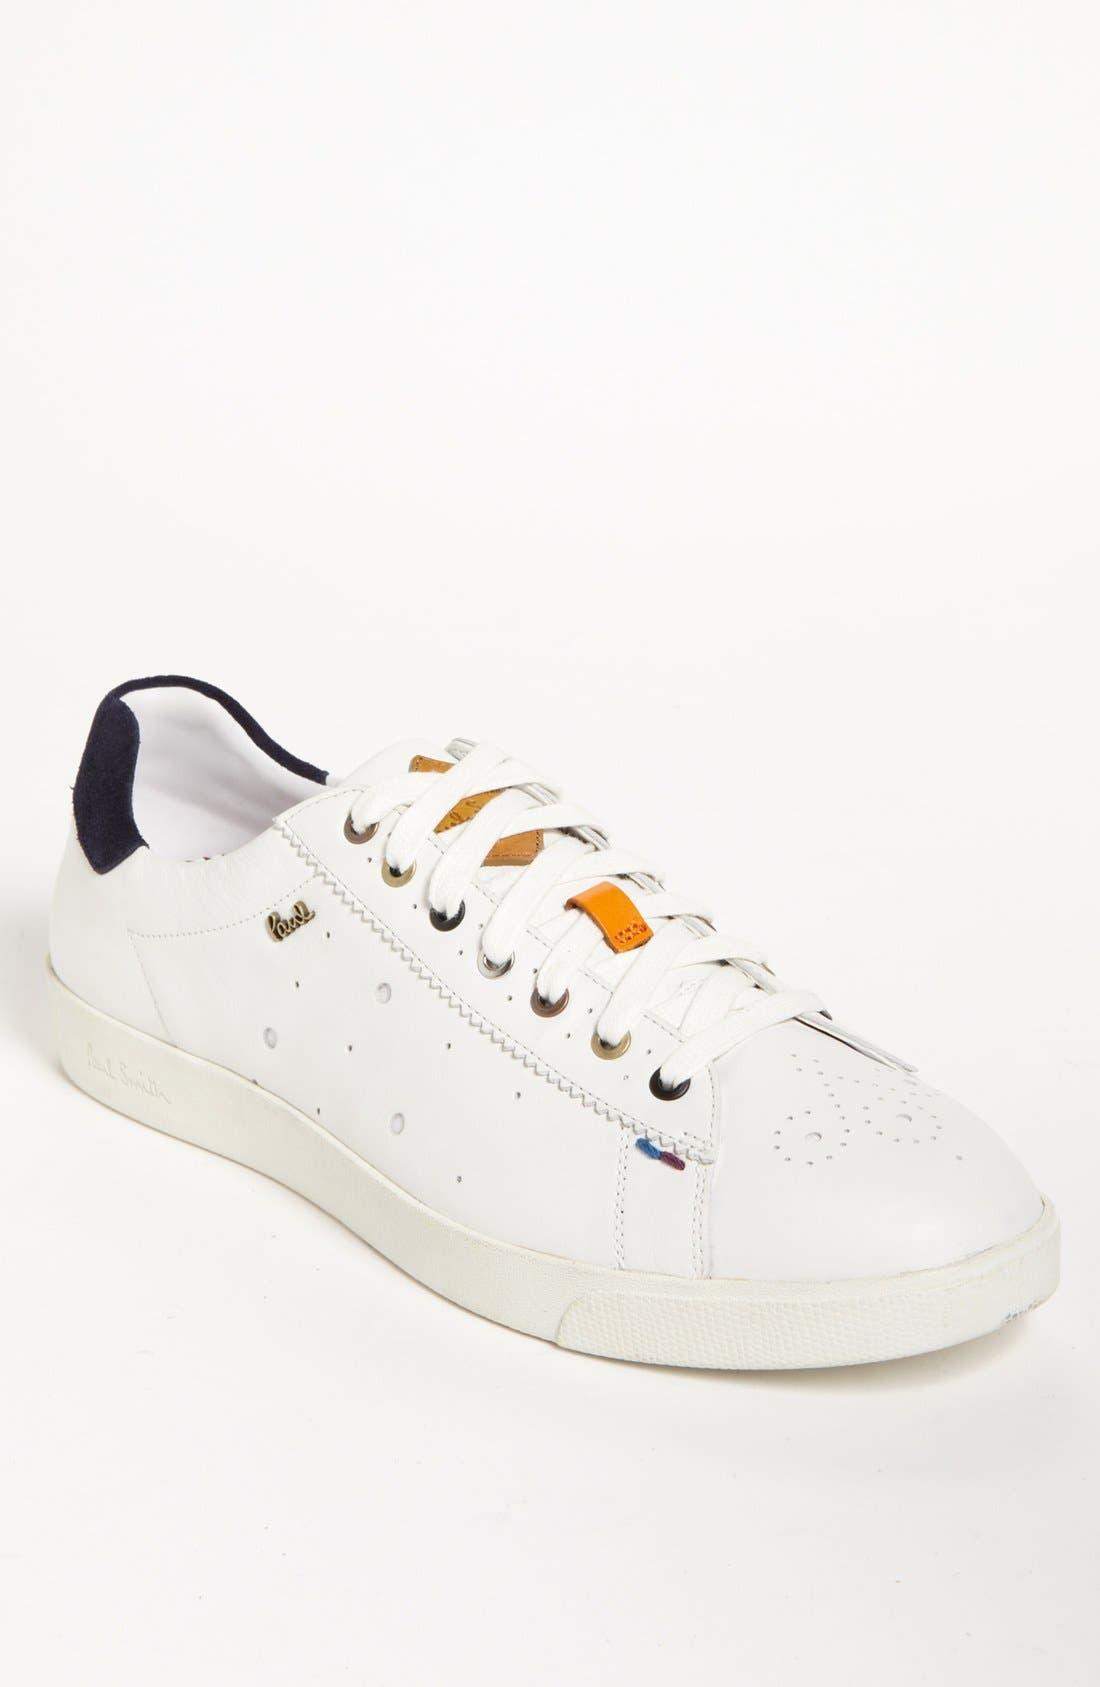 Main Image - Paul Smith 'Lepus' Sneaker